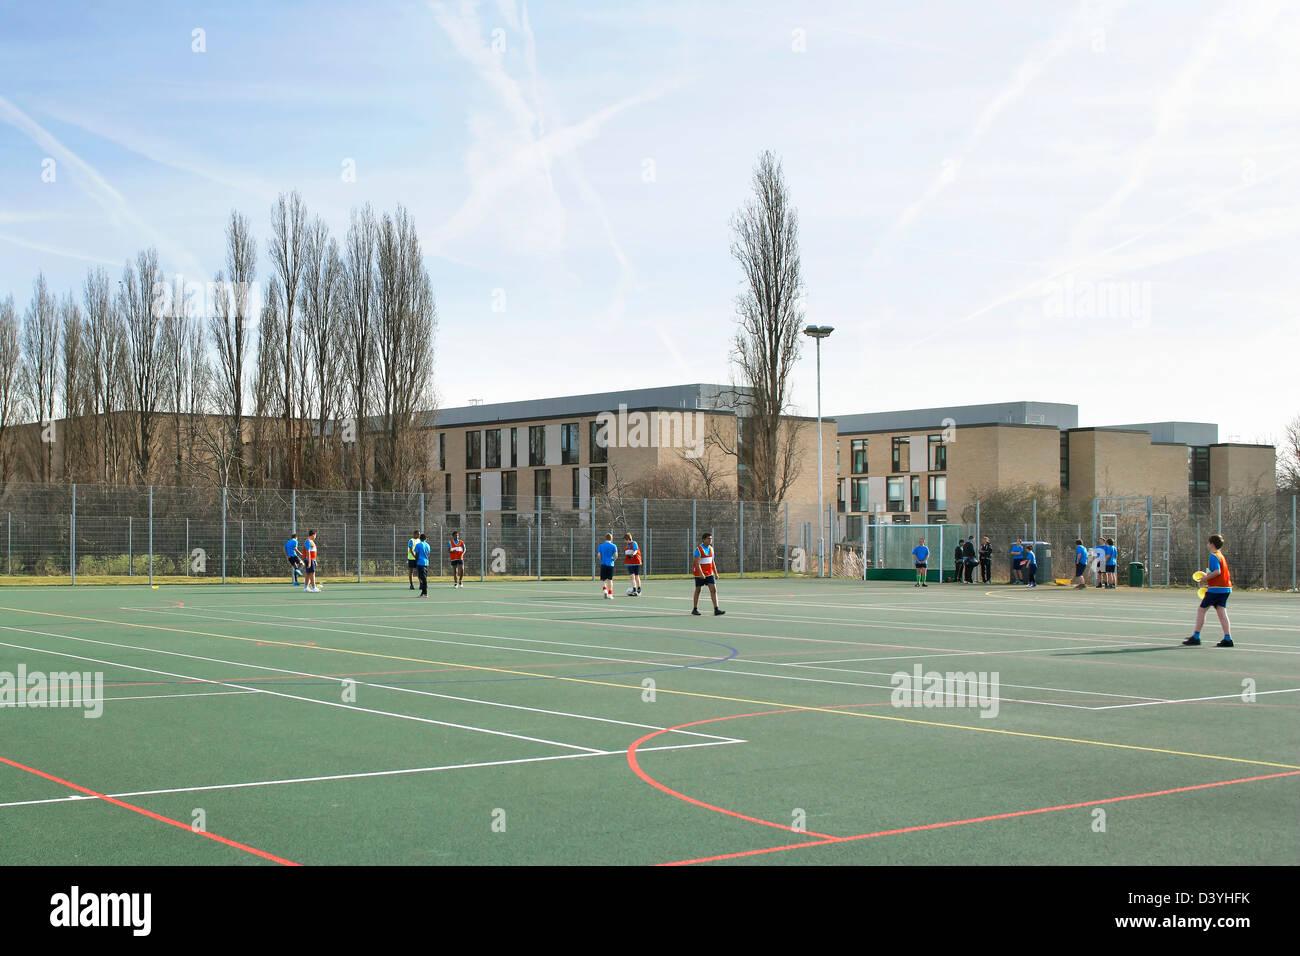 Thomas Tallis School, Greenwich, United Kingdom. Architect: John McAslan & Partners, 2012. Sports field. - Stock Image